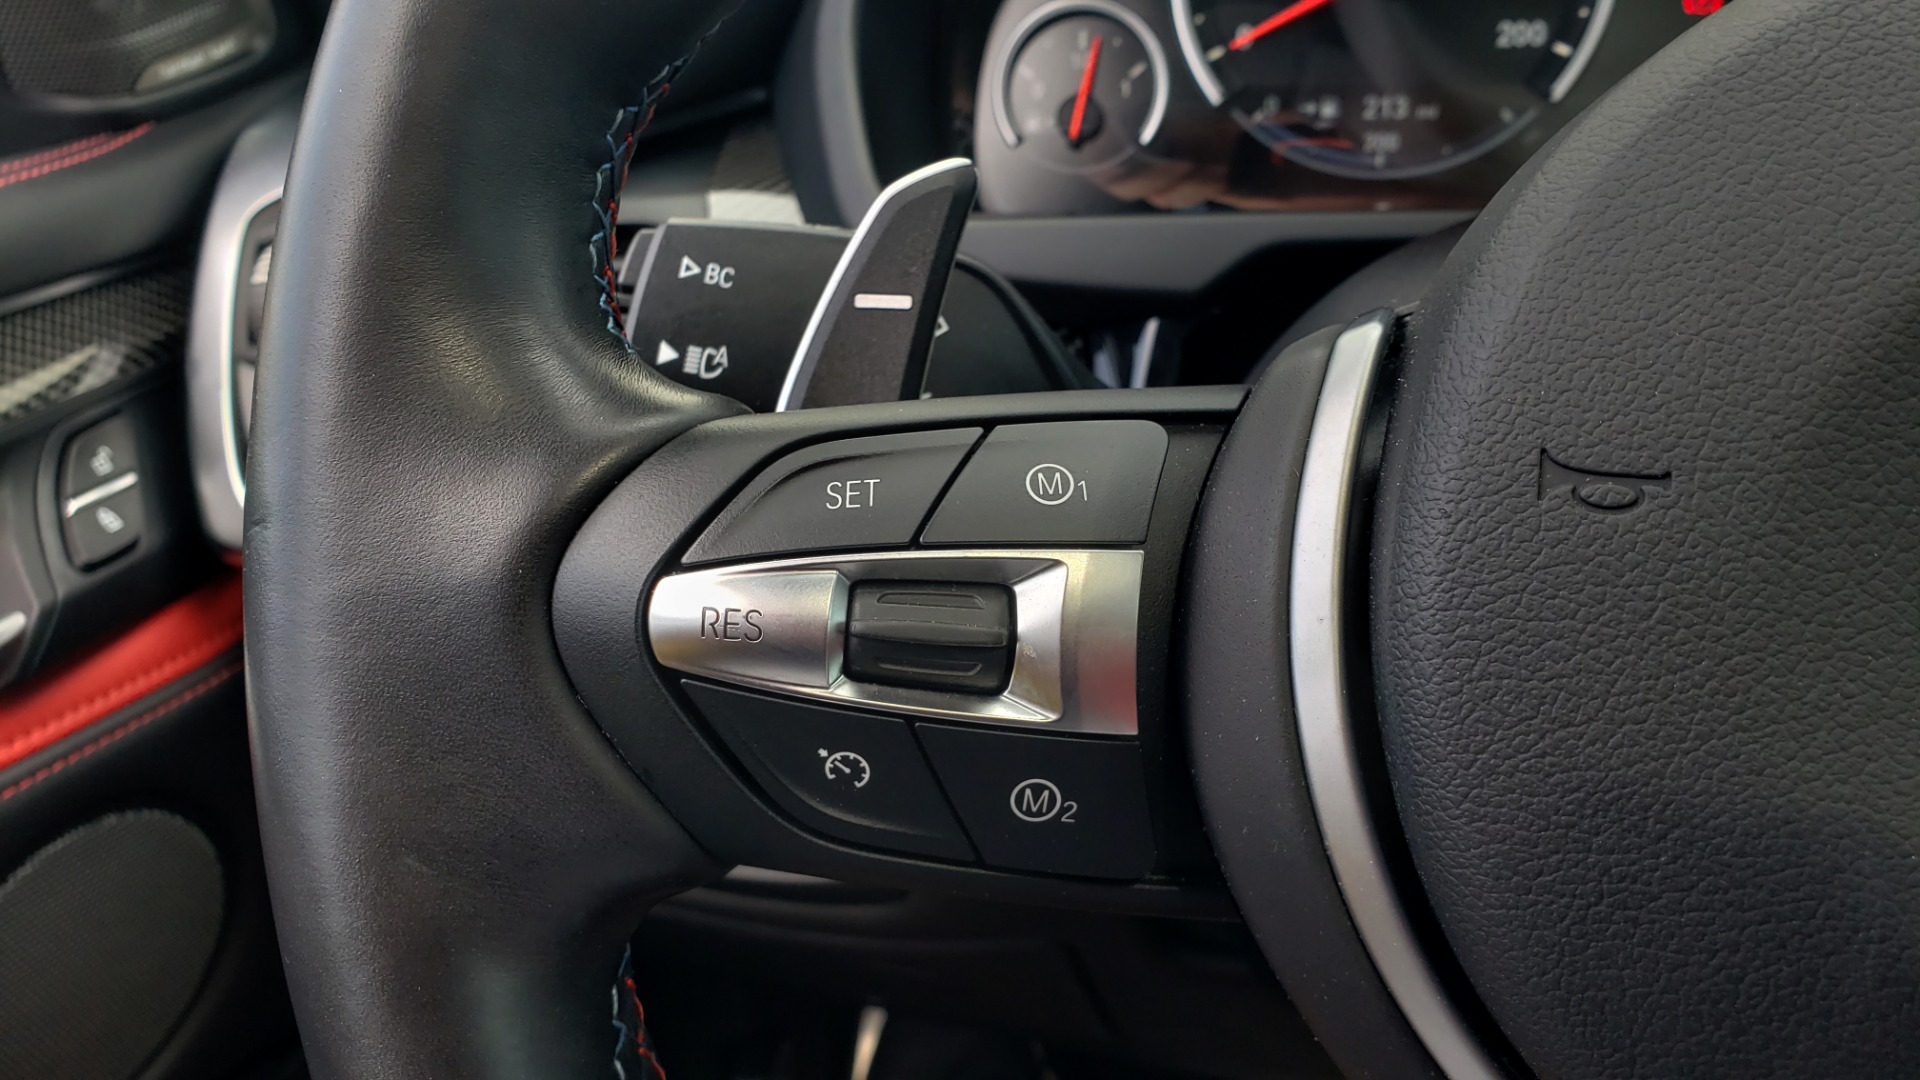 Used 2017 BMW X5 M EXECUTIVE PKG / NAV / DRVR ASST / BSM / HUD / HTD STS / WIFI for sale Sold at Formula Imports in Charlotte NC 28227 39